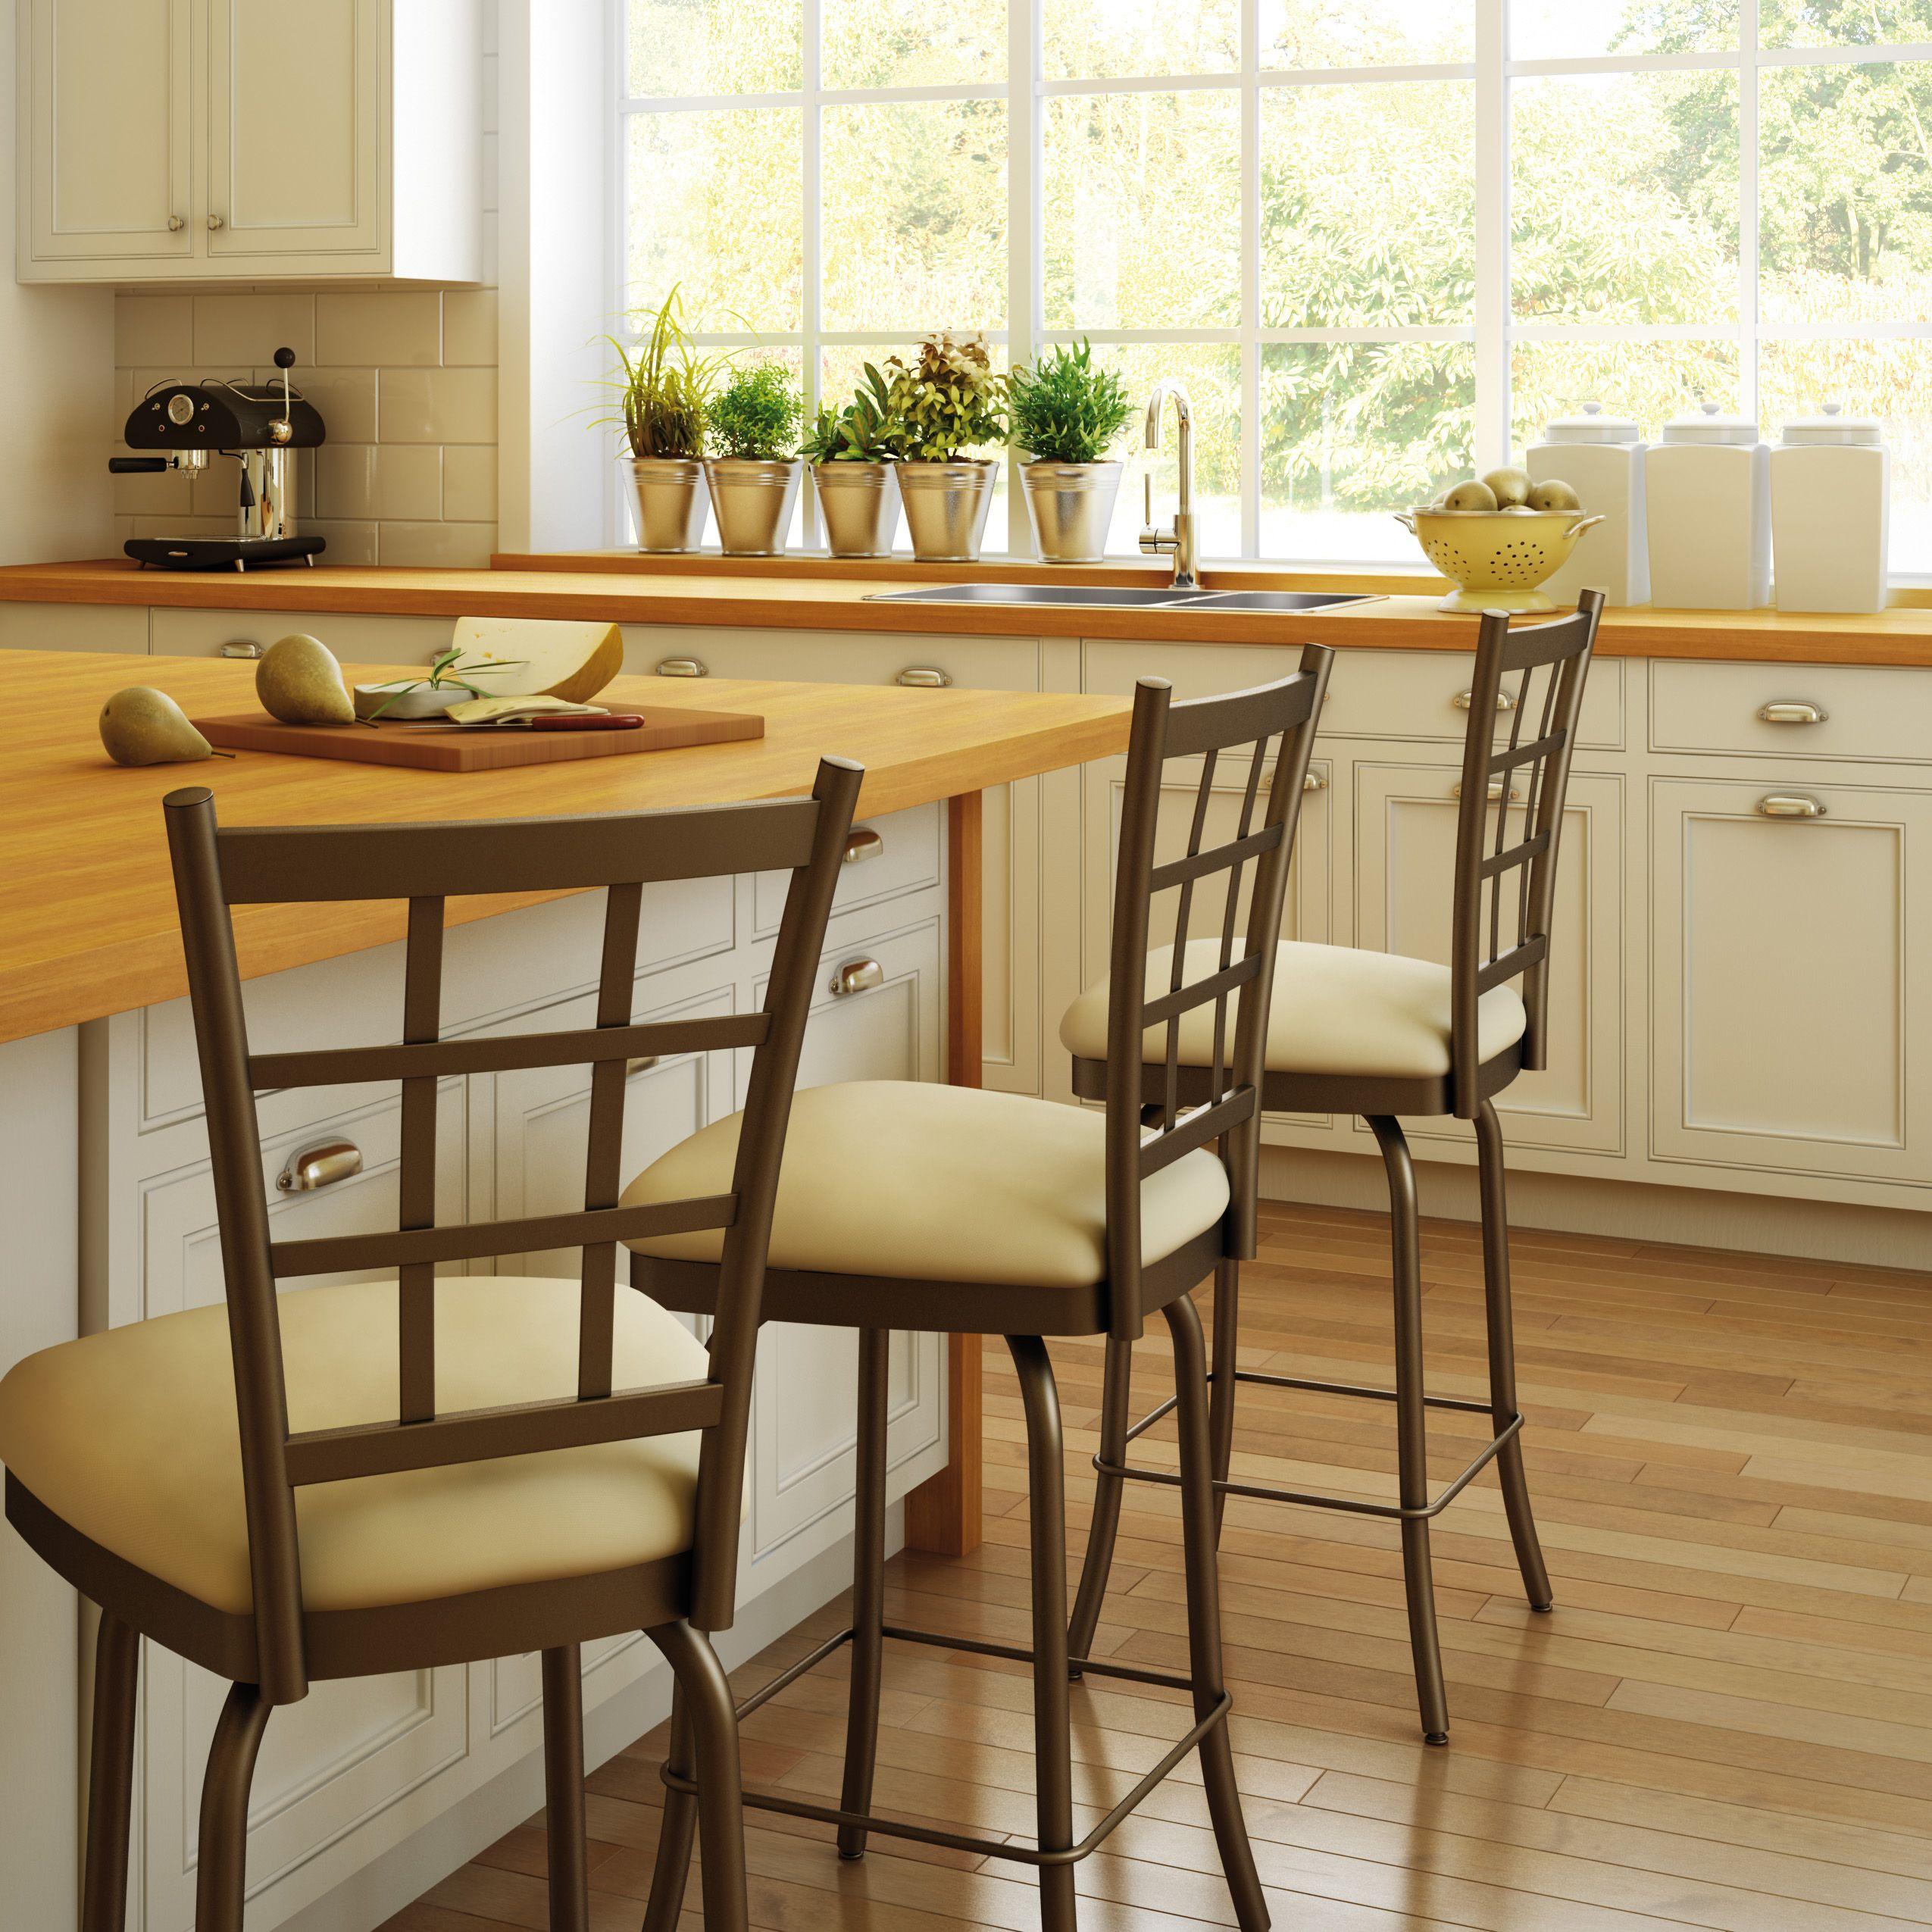 AMISCO Jamie Stool Furniture Kitchen Countryside